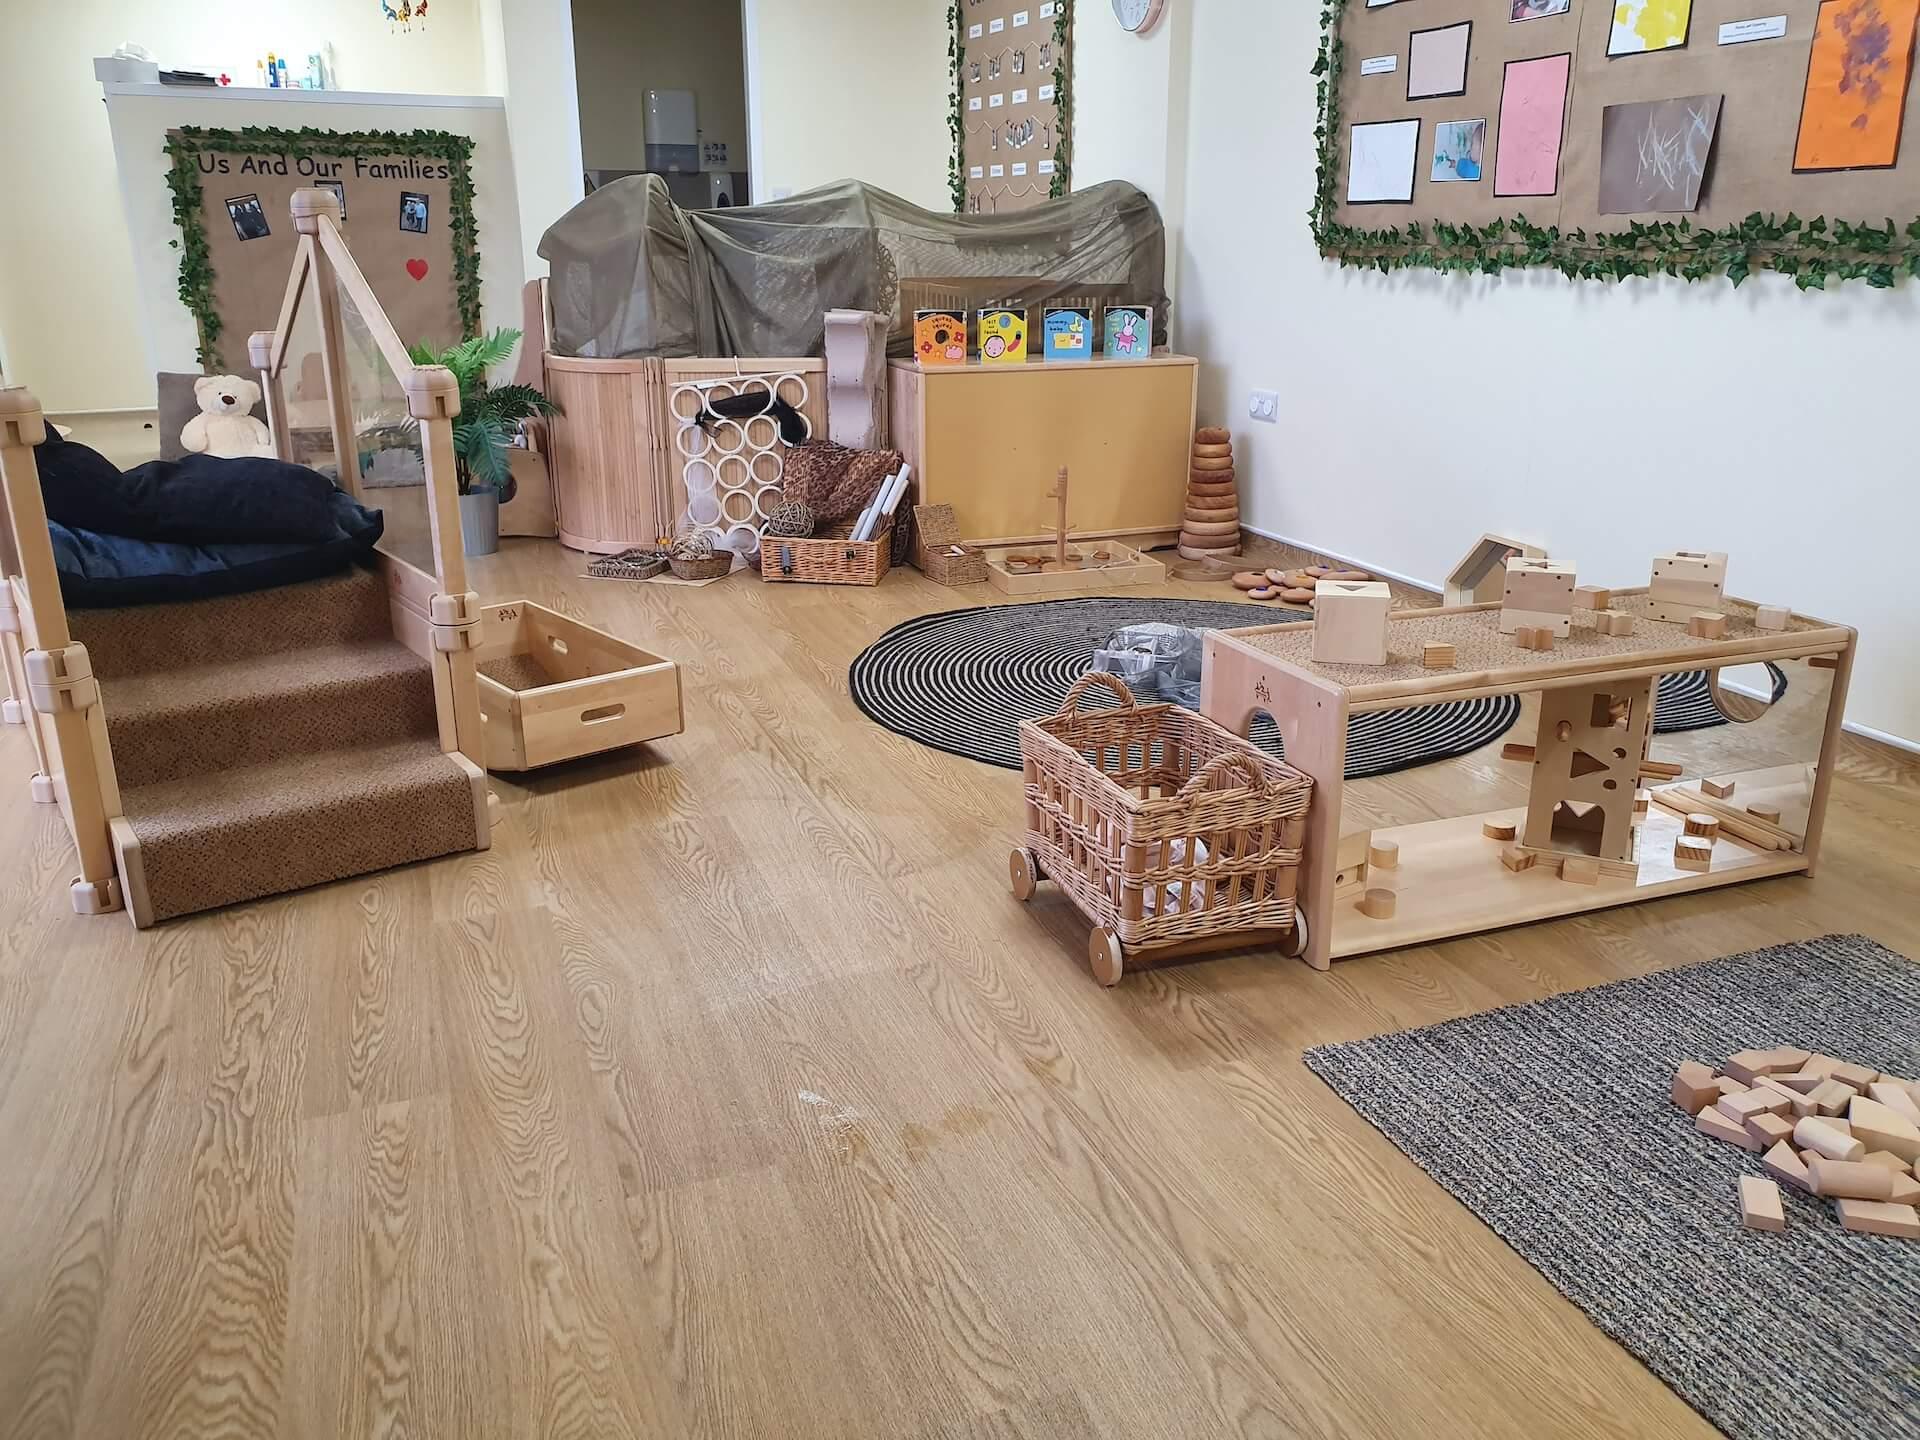 Kimberworth Baby Room